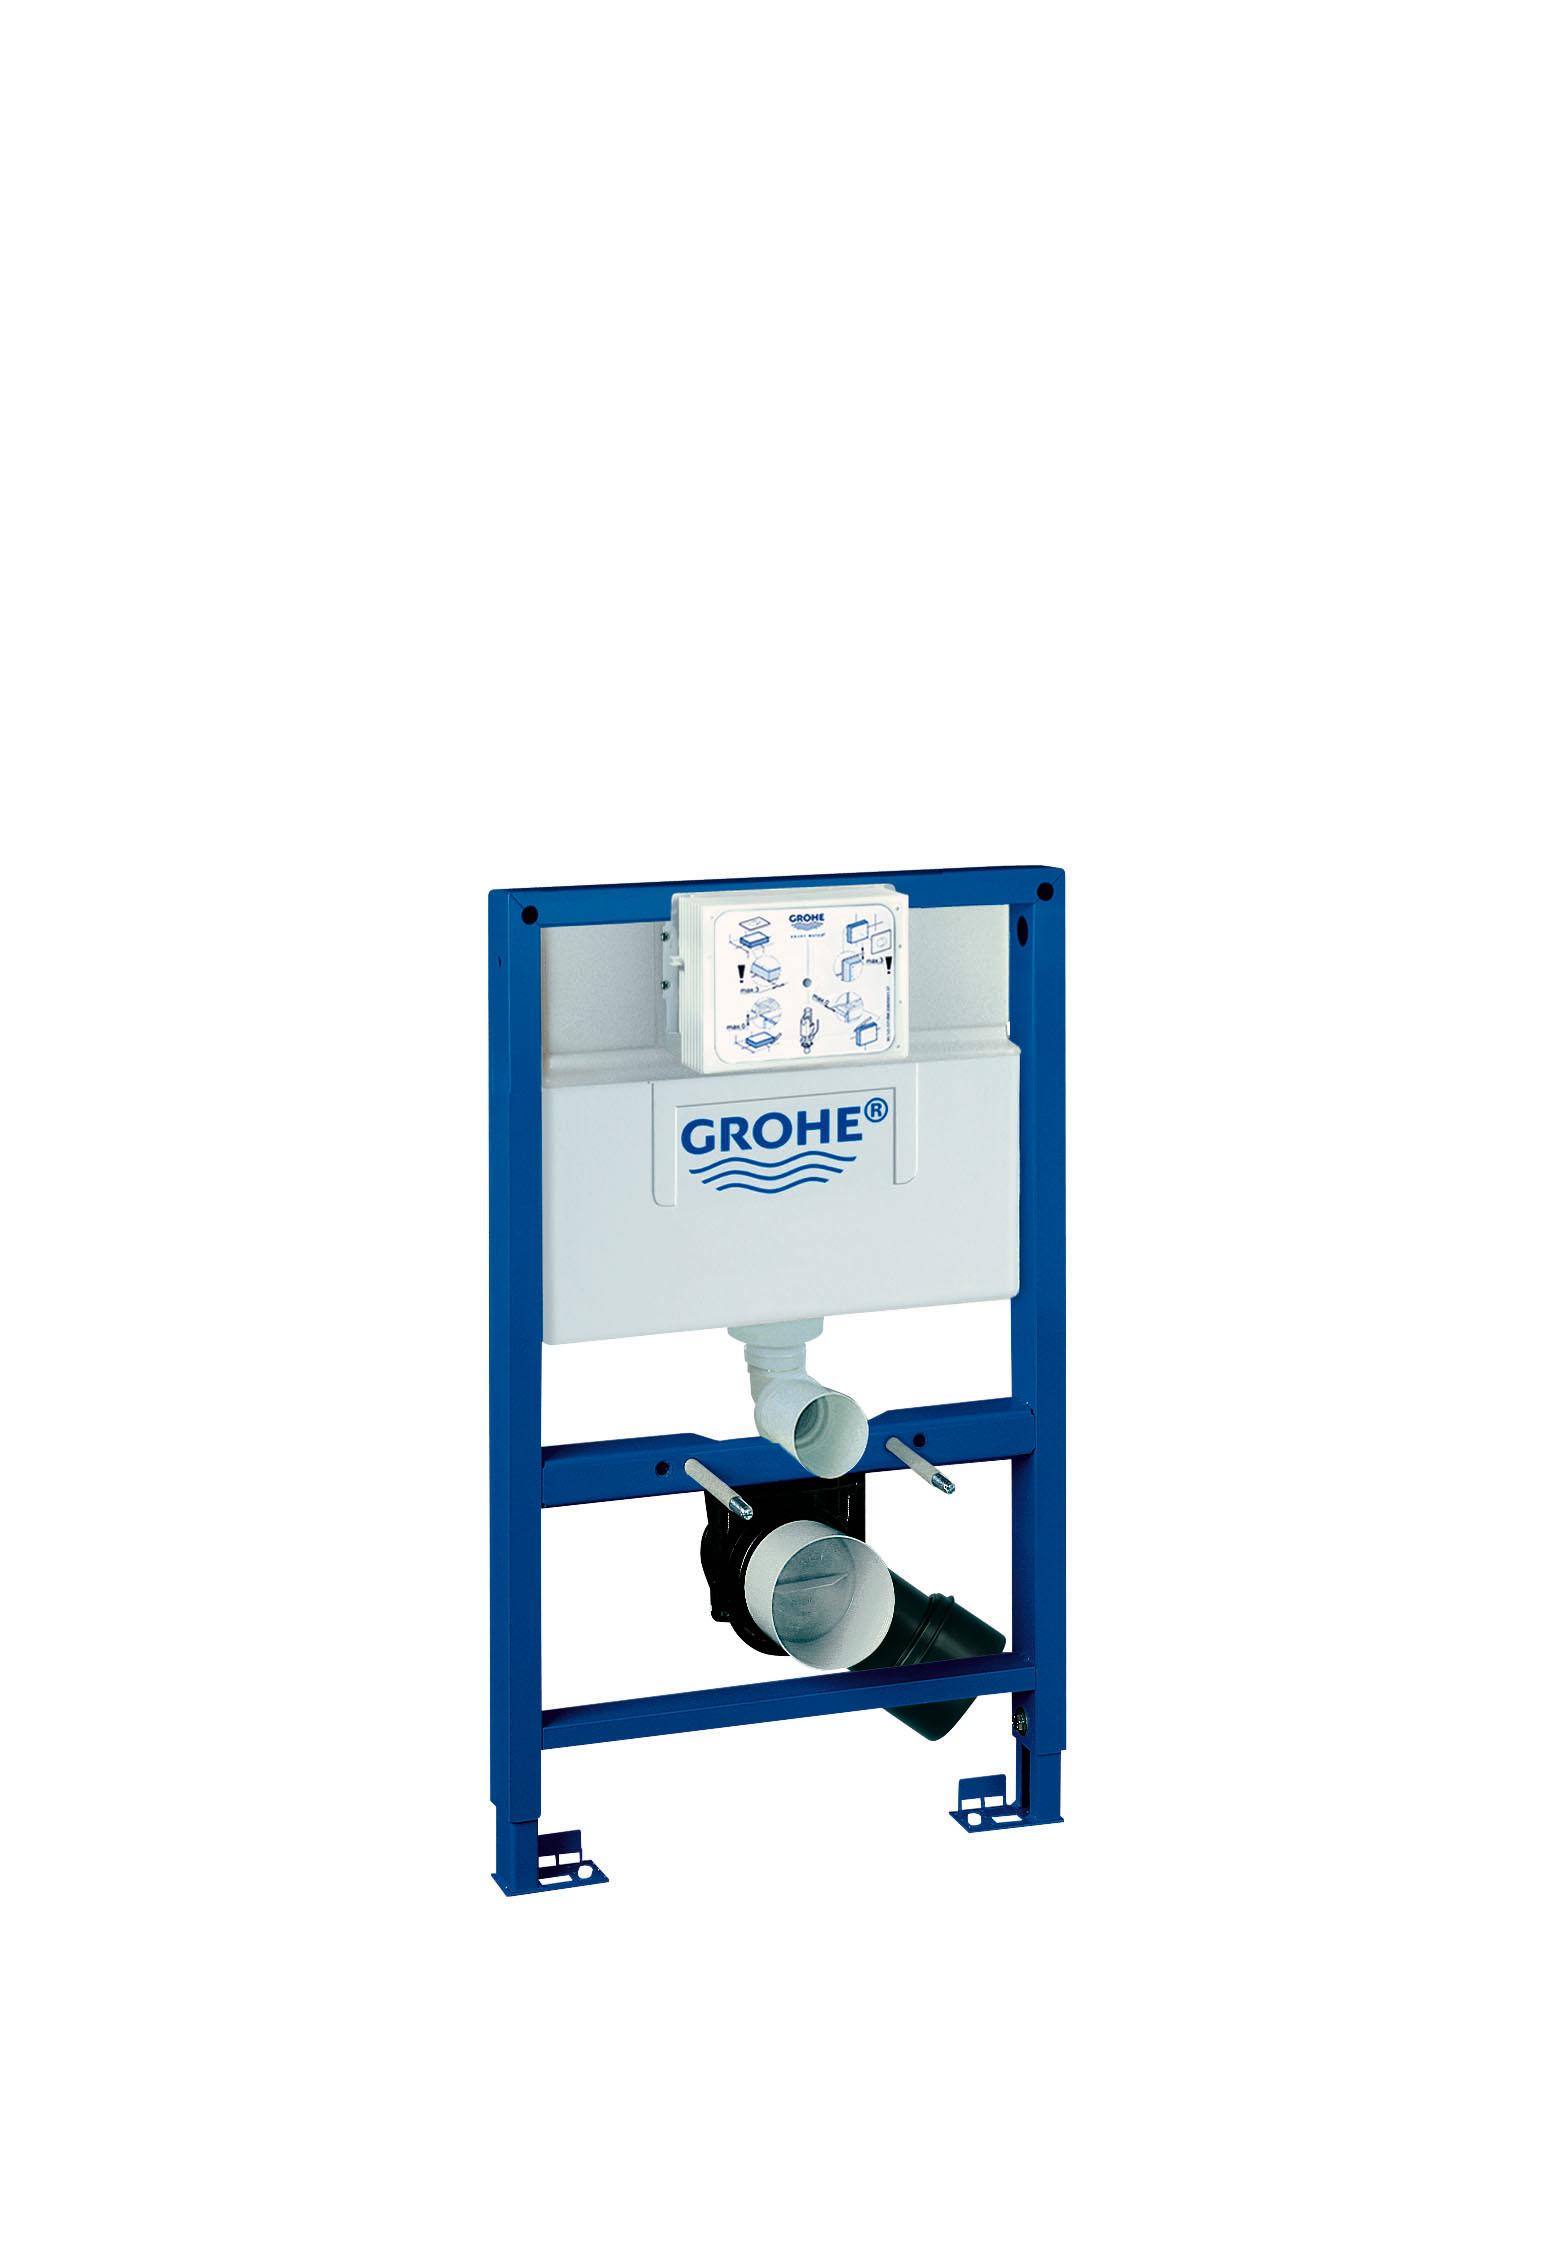 Инсталляция Grohe Rapid sl 38526000 инсталляция 4в1 grohe rapid sl 38813001